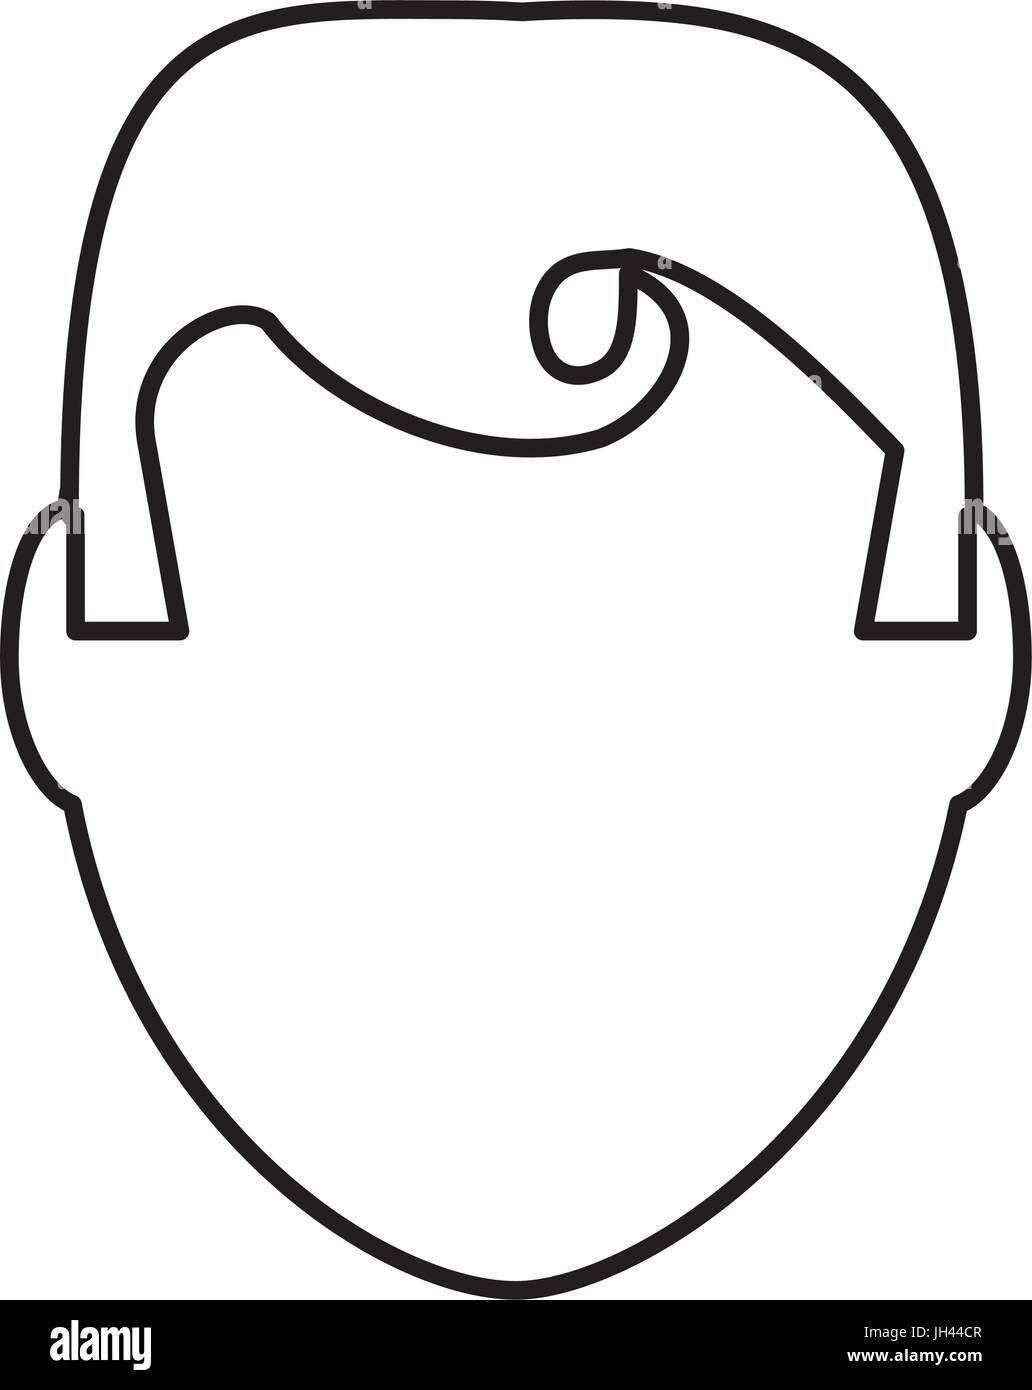 Retro Man cartoon icon vector illustration graphic design - Stock Image